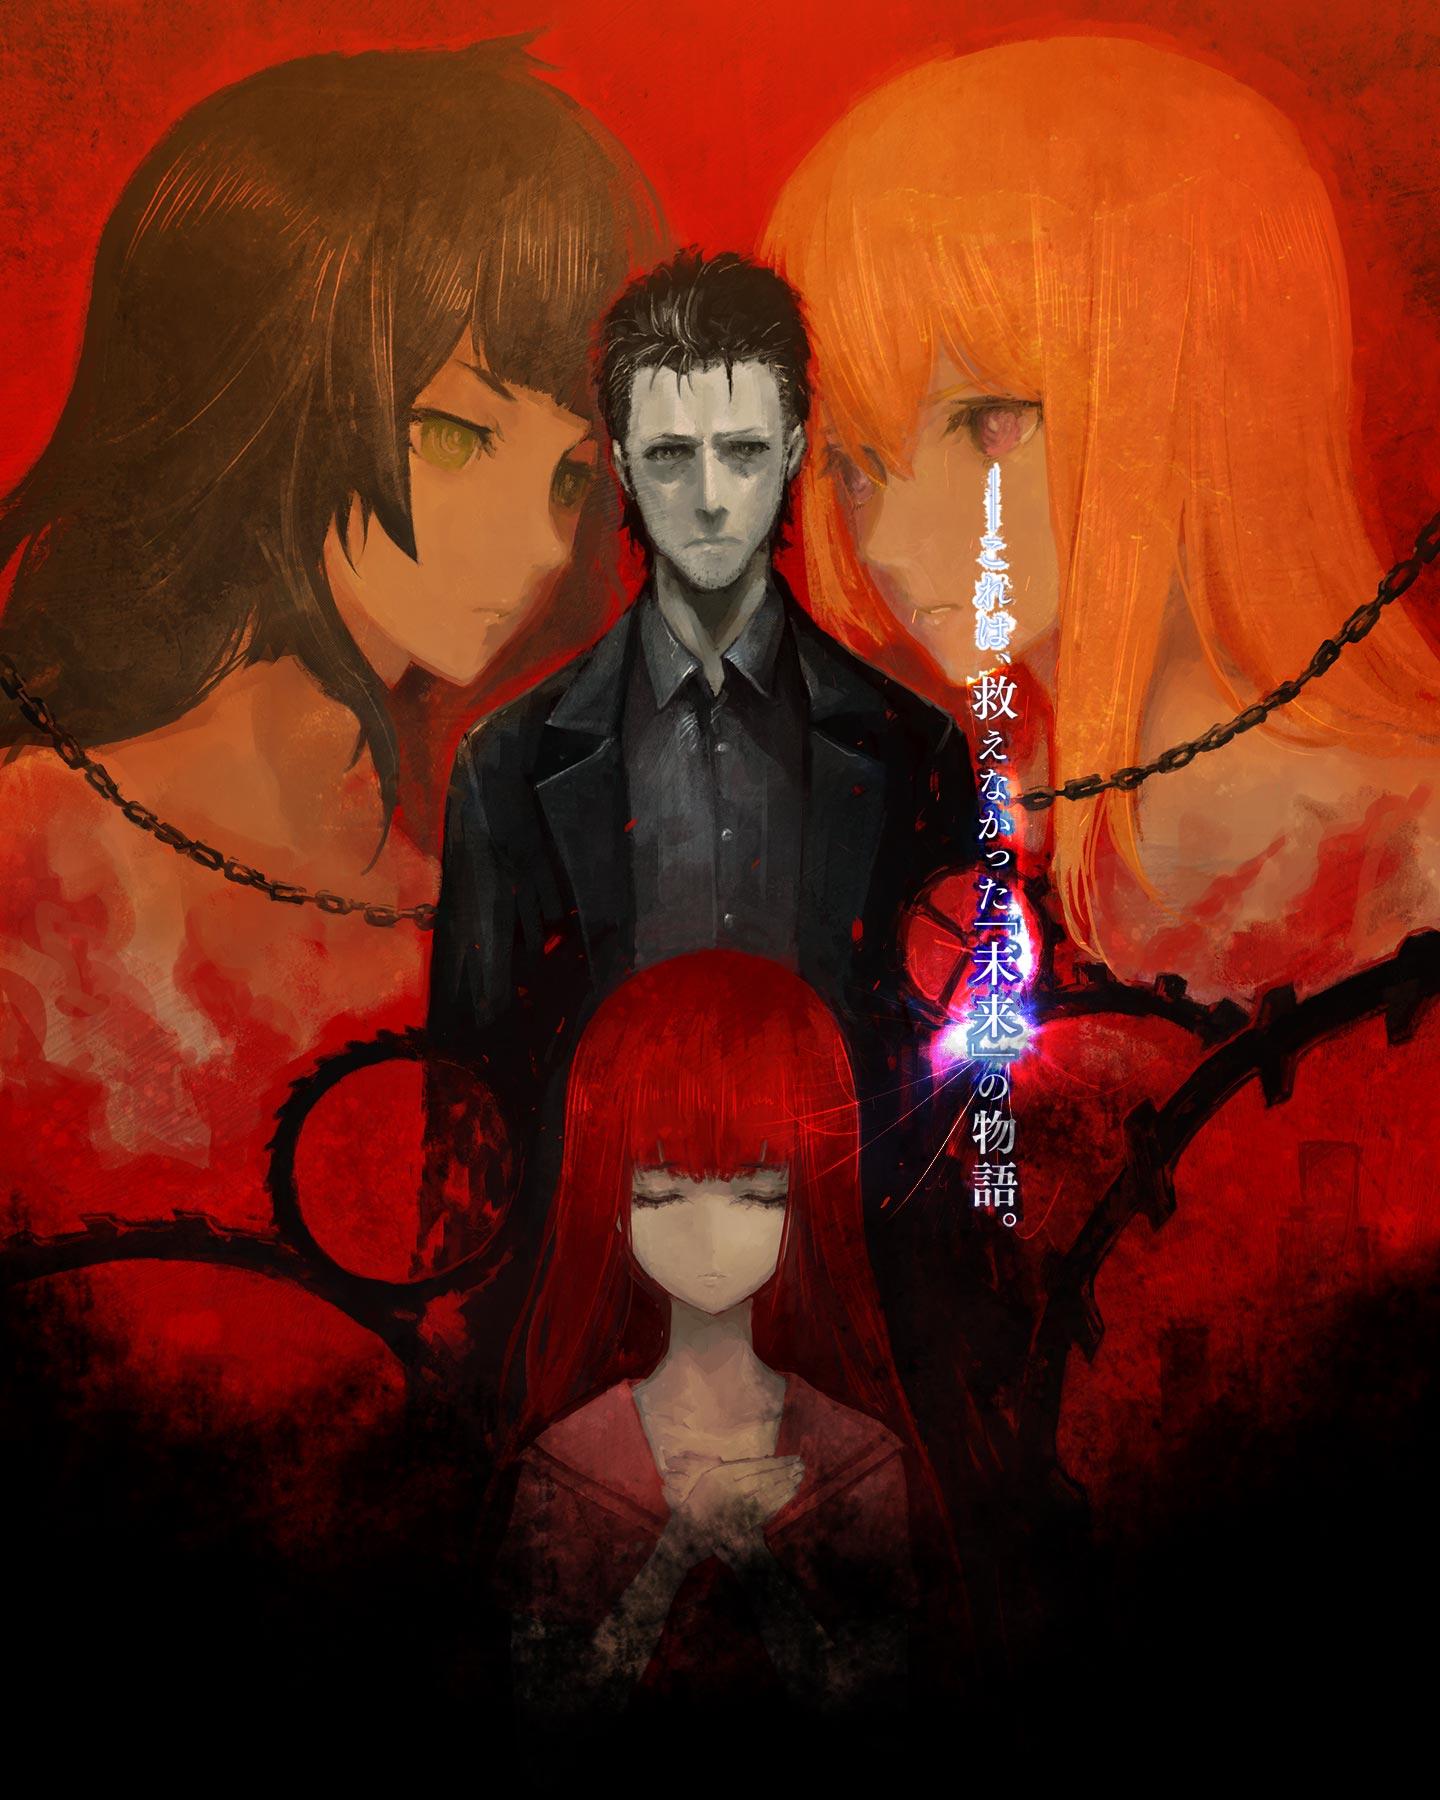 spring 2018 anime release steemit